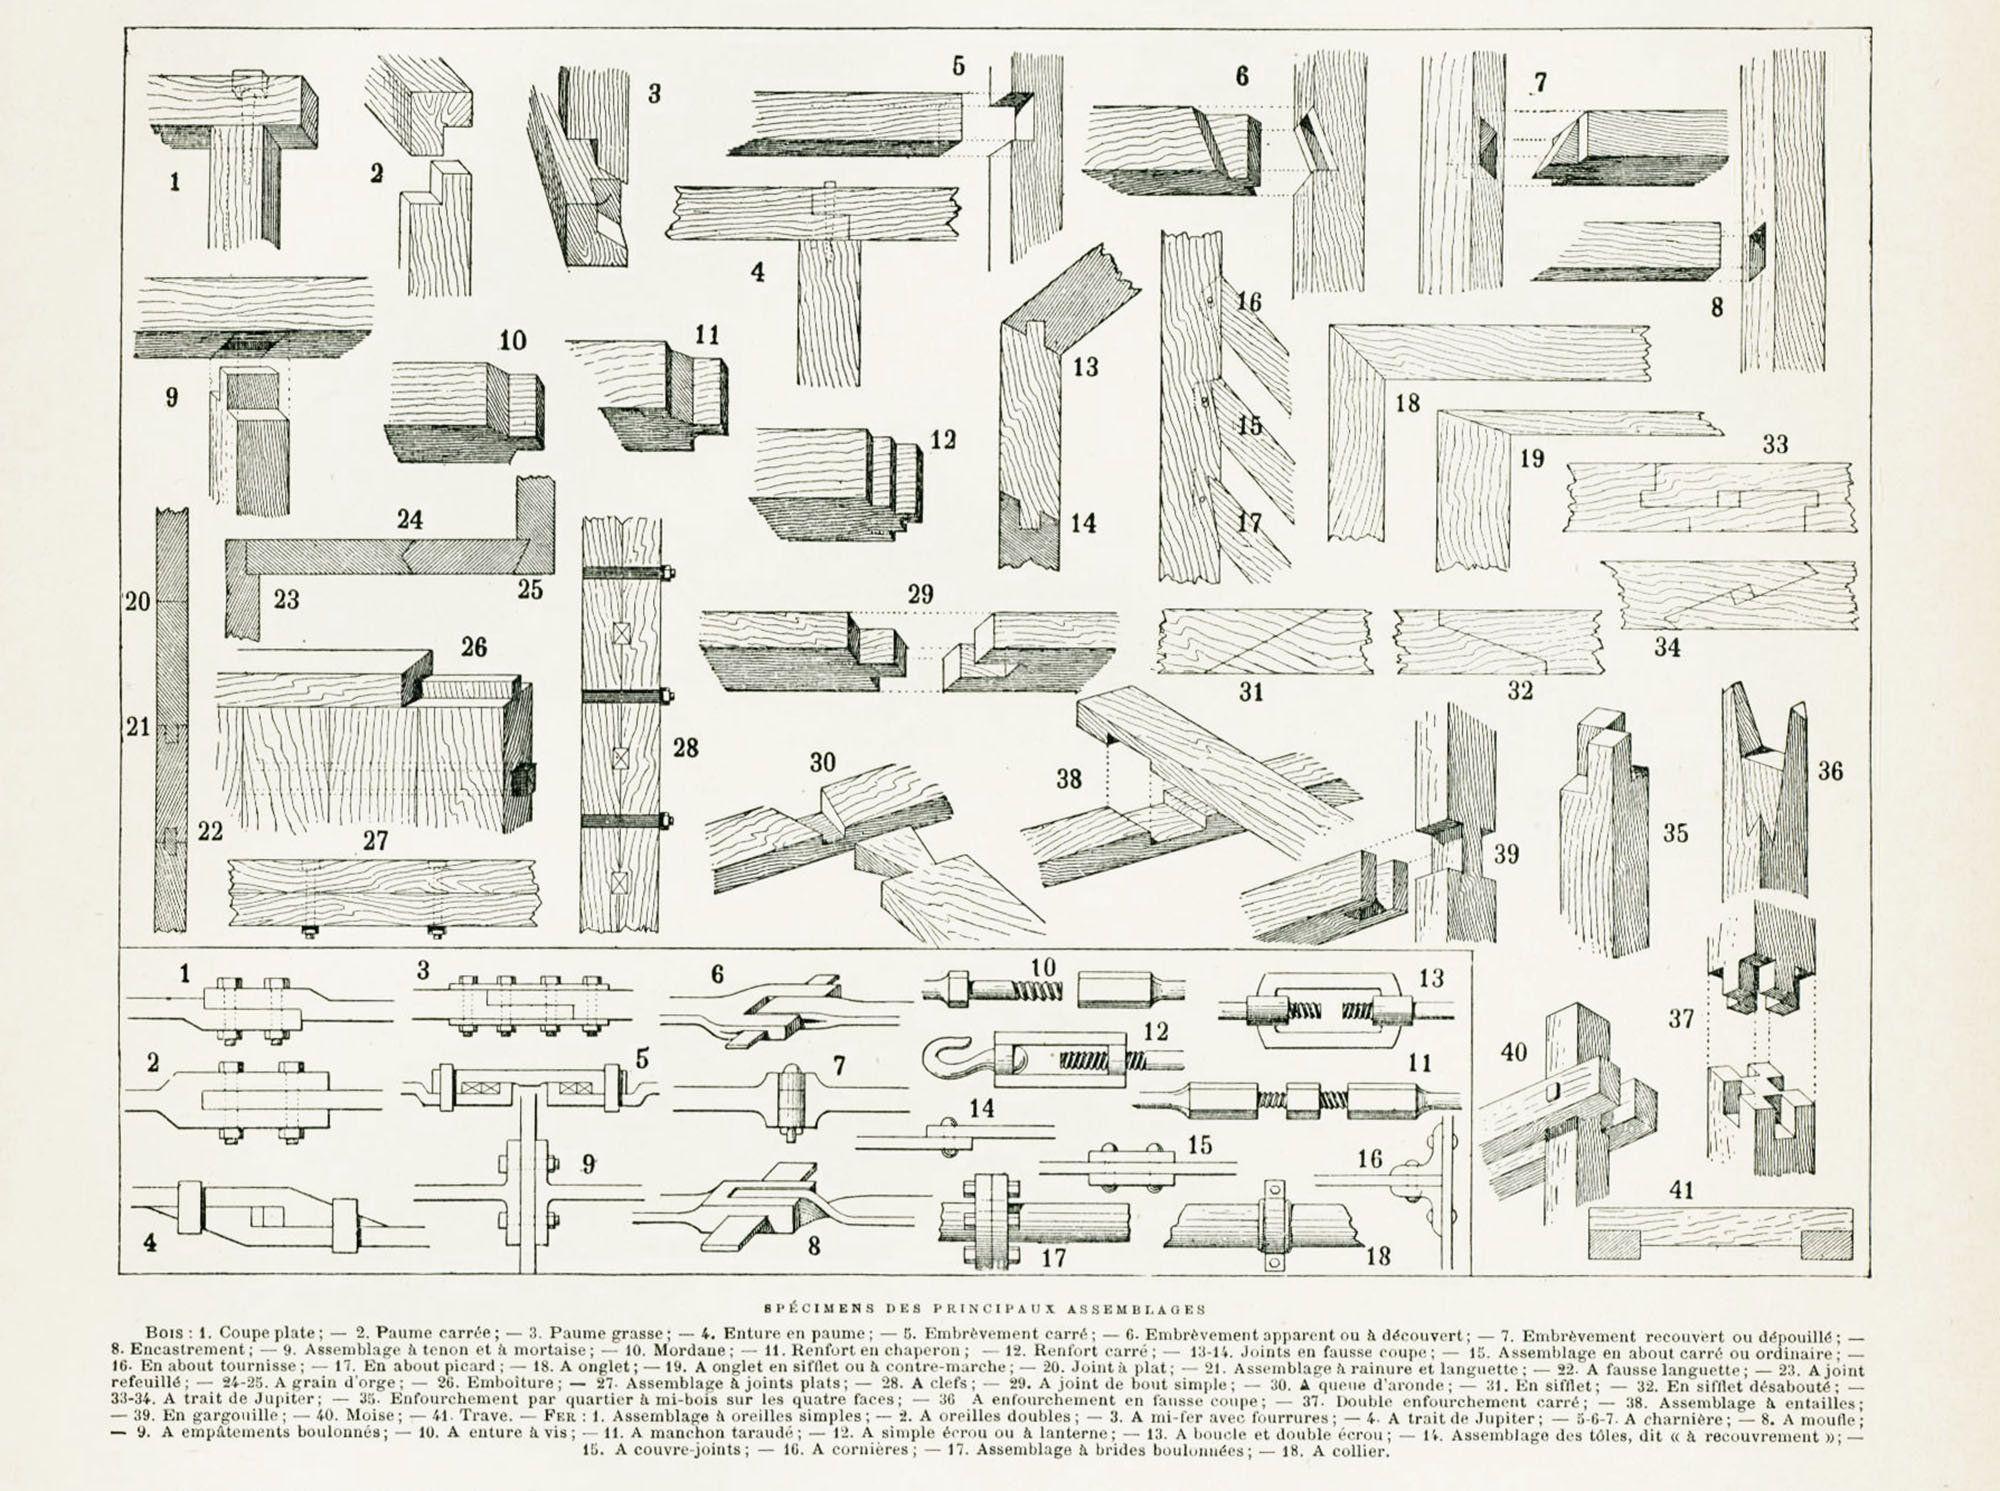 1897 Assemblage Bois Menuiserie Charpente Planche Originale